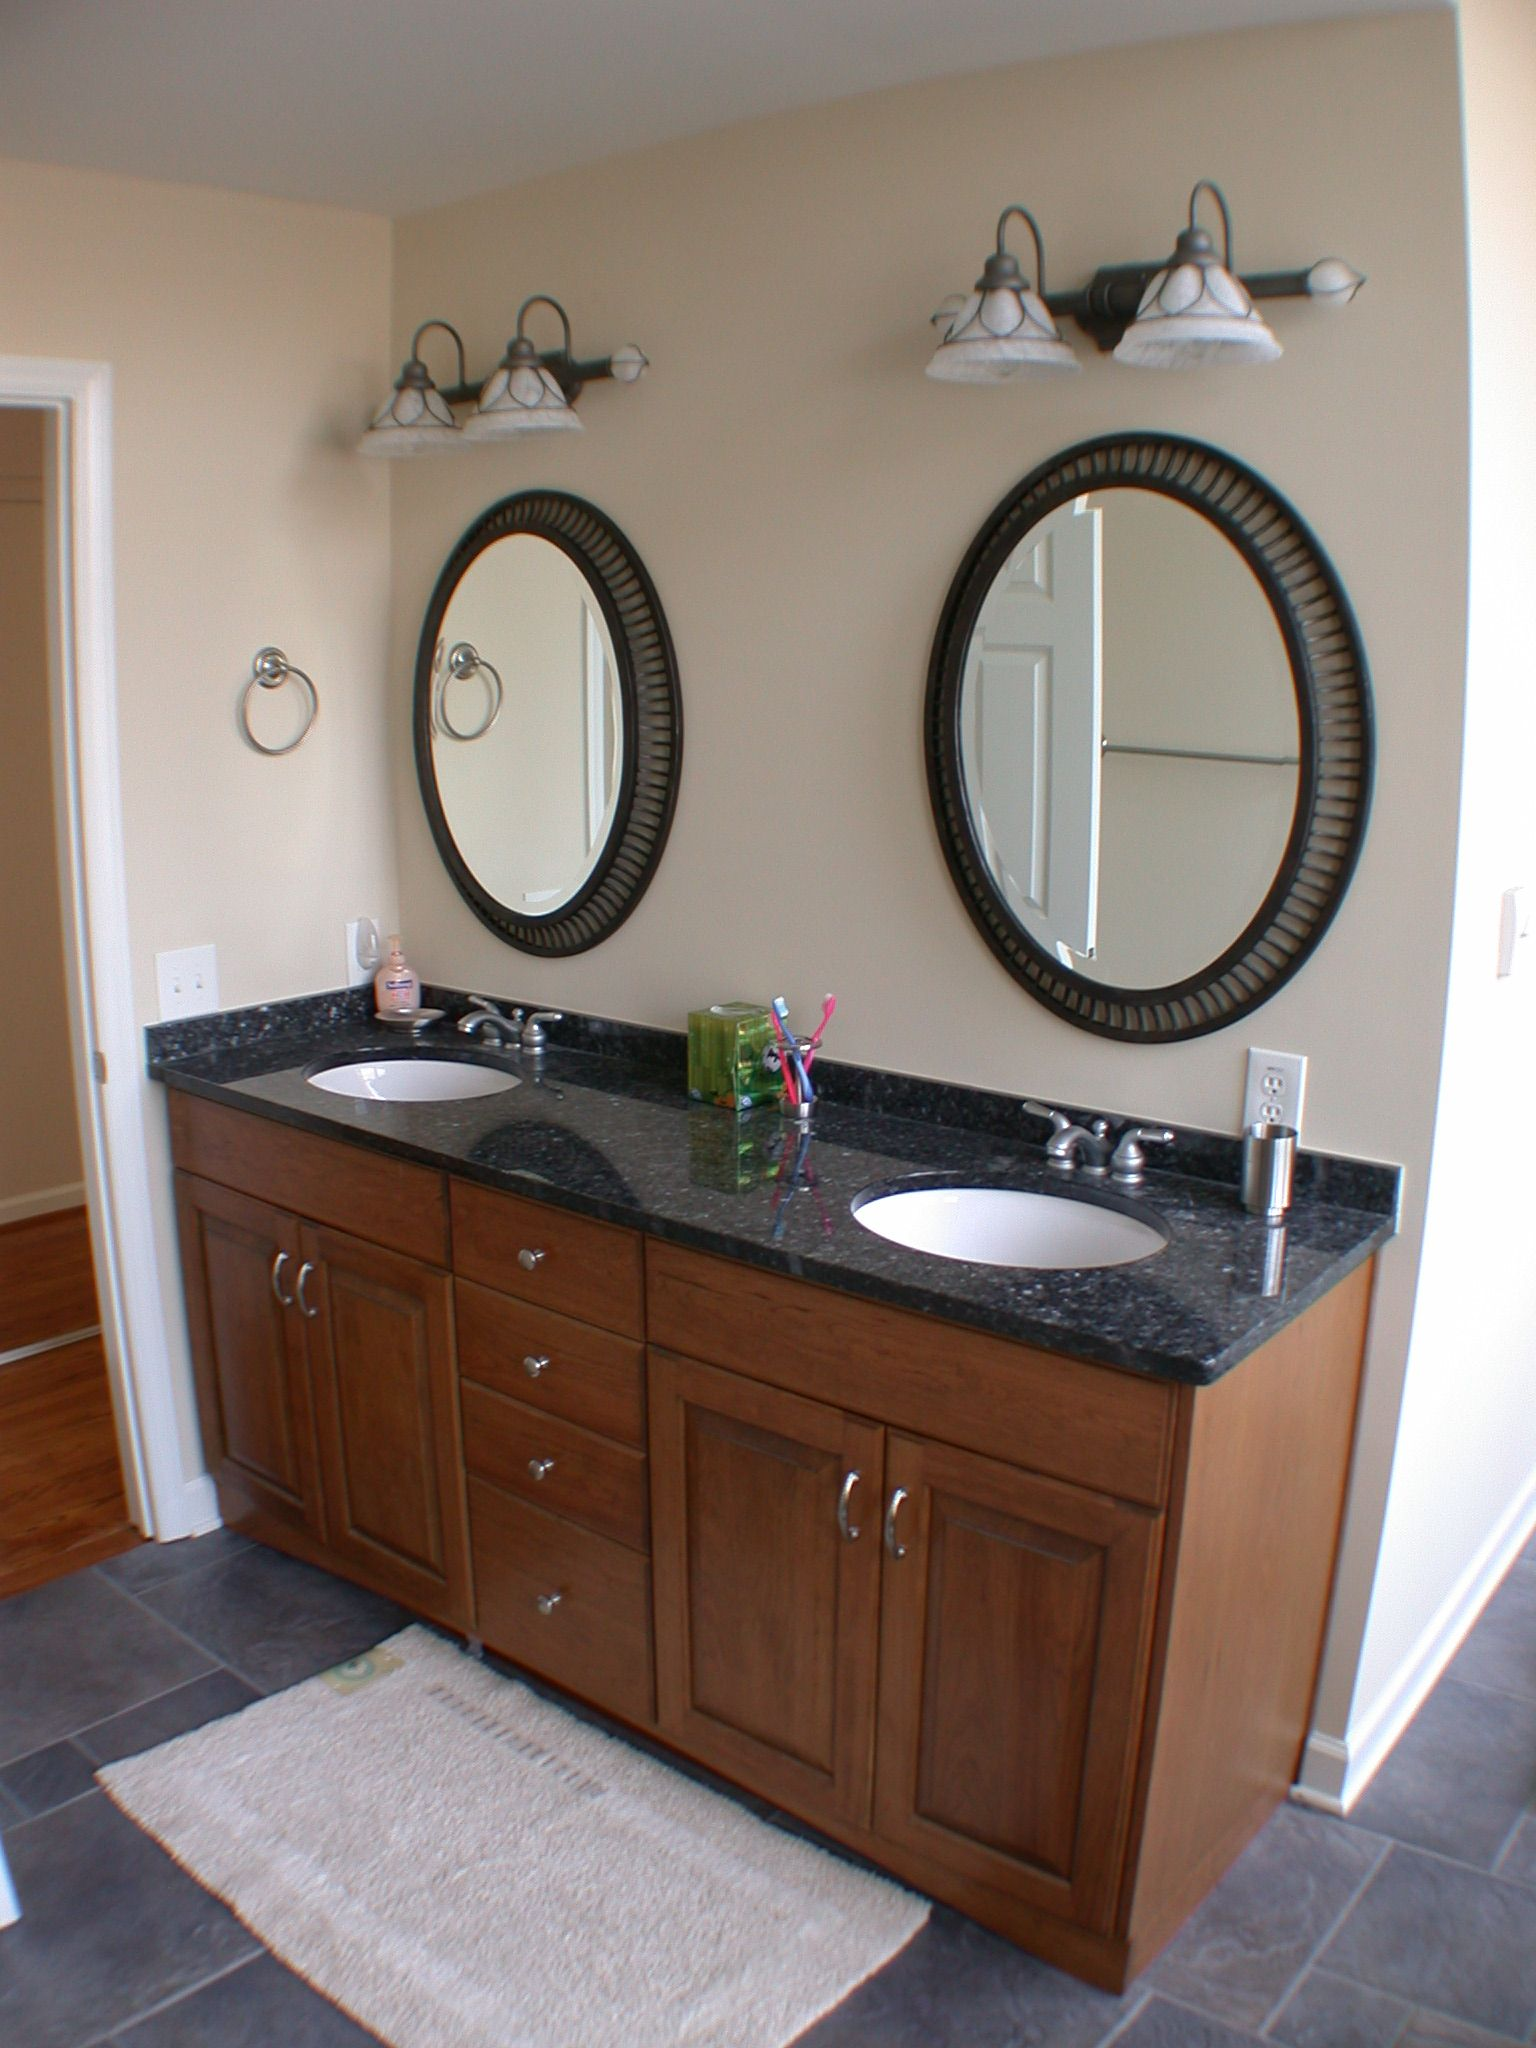 17 Best images about Bathroom Vanities on Pinterest   Contemporary vanity   Contemporary bathrooms and Shaker style. 17 Best images about Bathroom Vanities on Pinterest   Contemporary